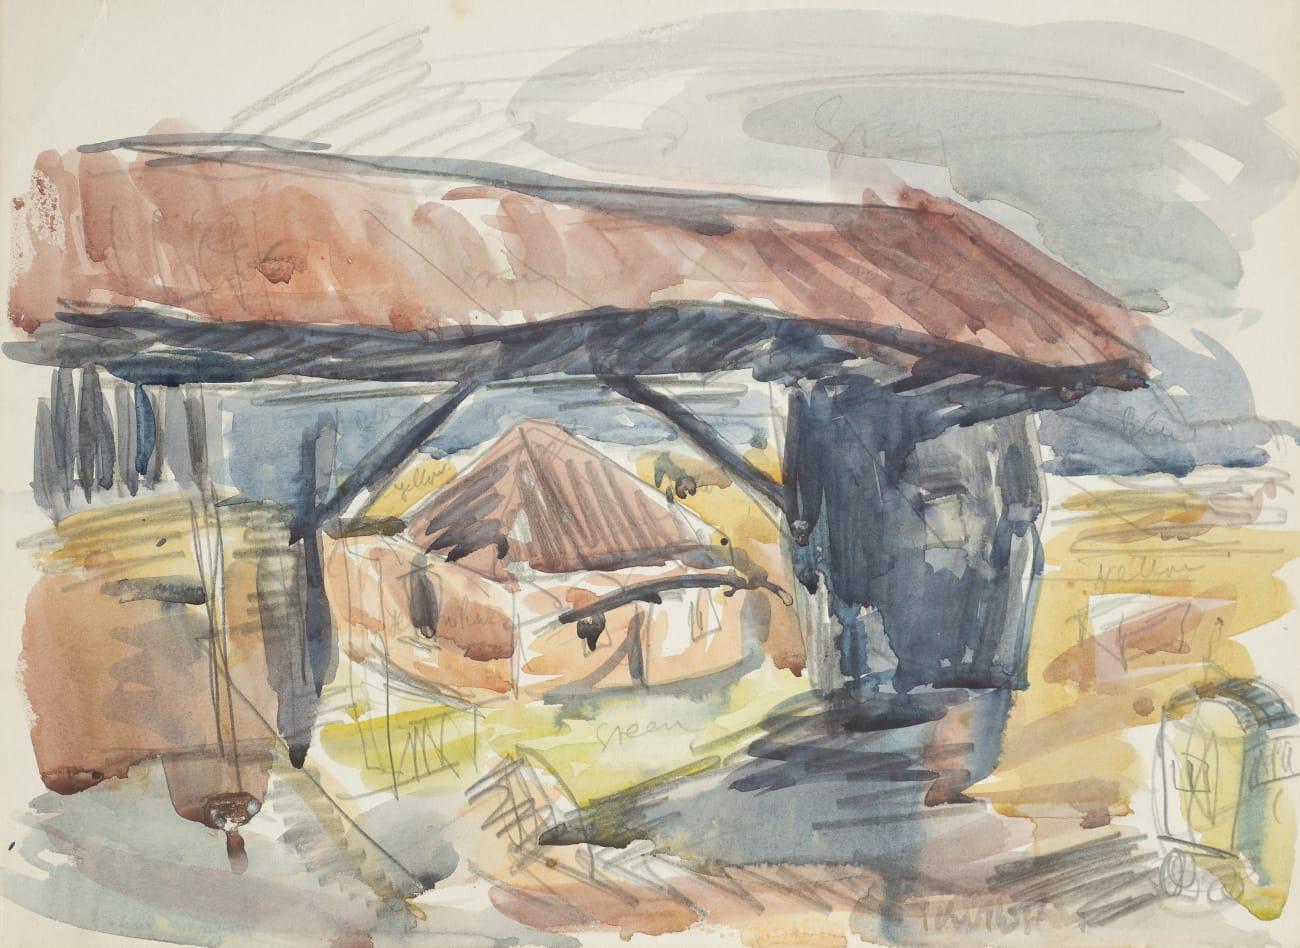 Mountford Tosswill Woollaston, Sawmill at Ruru, c1954